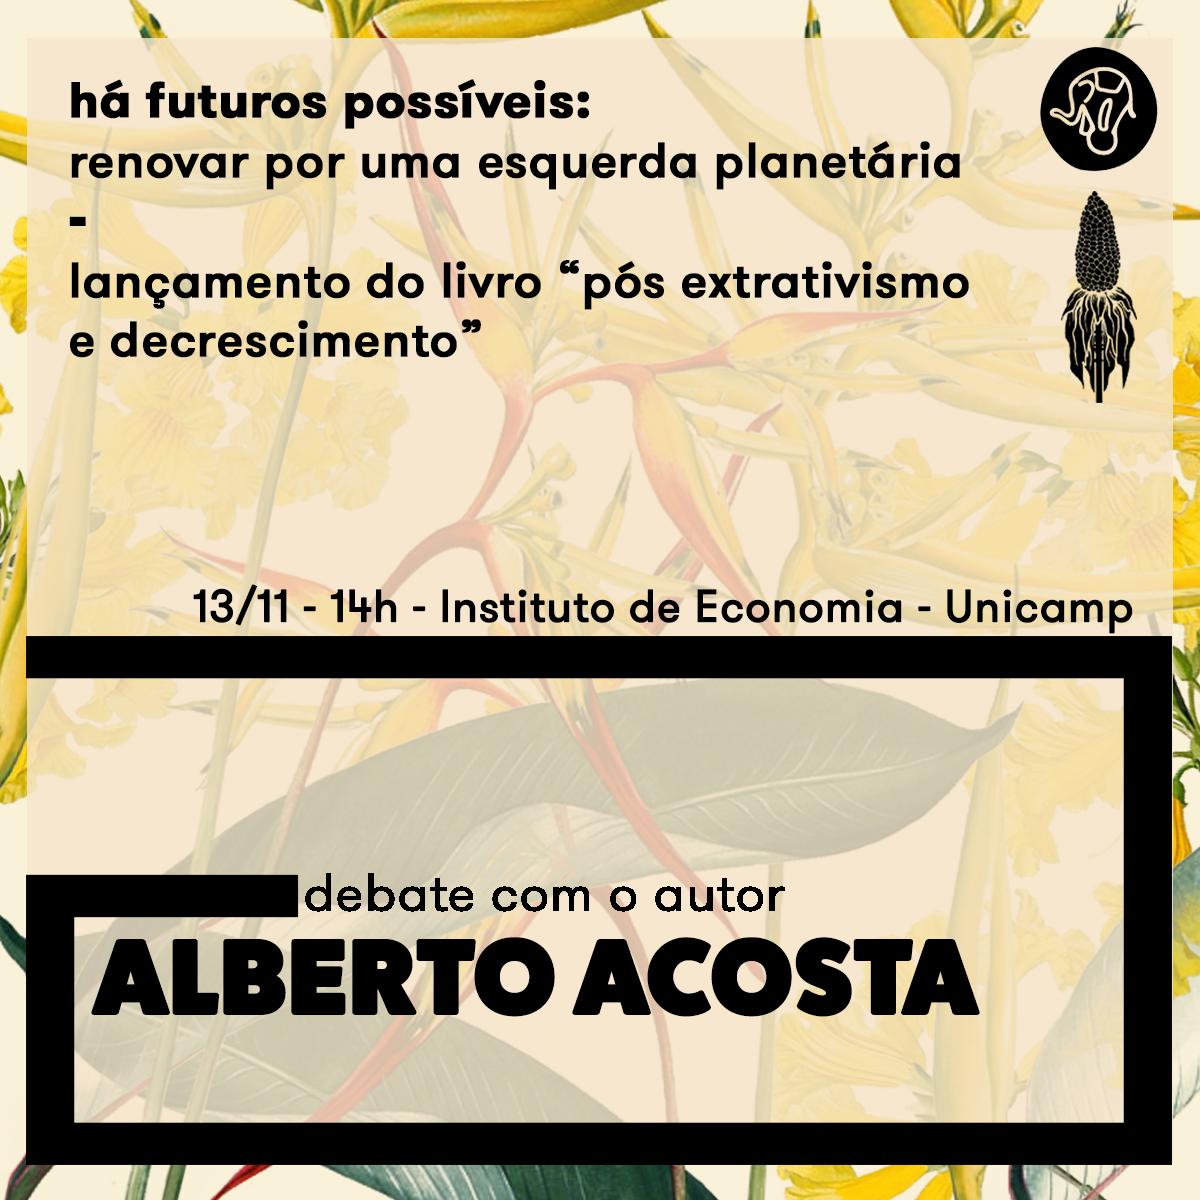 13/11/19 - Há futuros possíveis | com Alberto Acosta